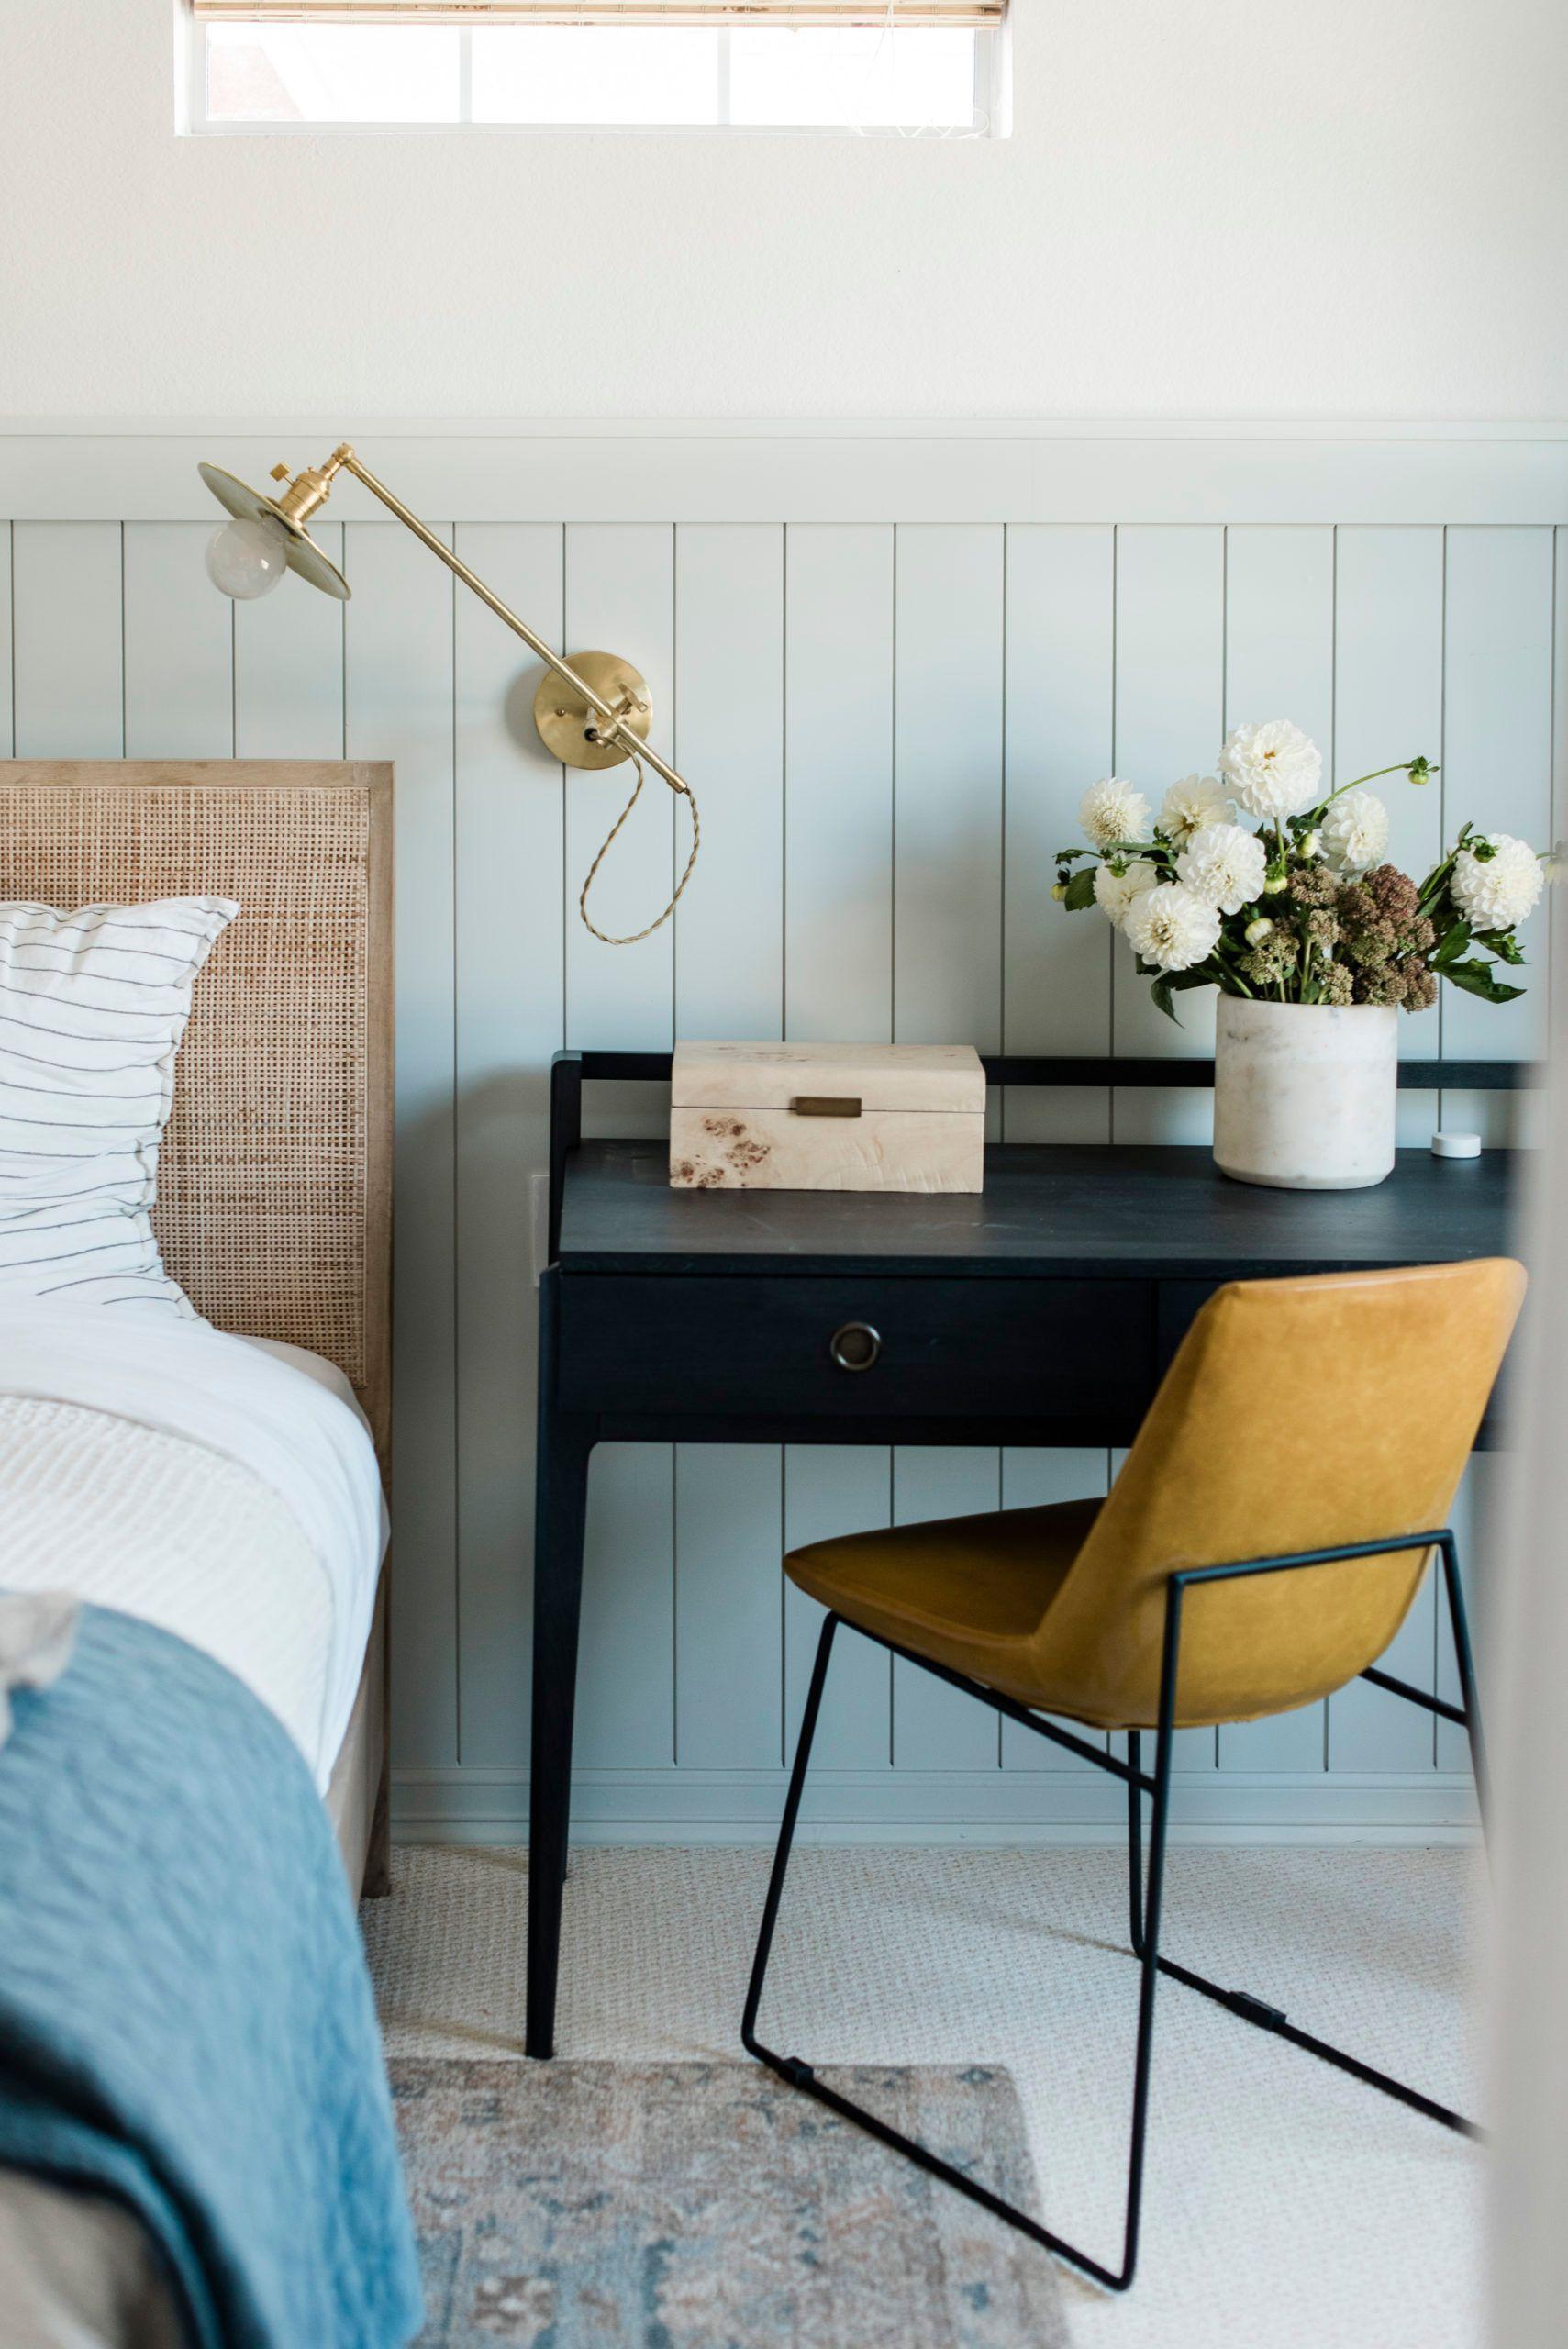 bedroom inspiration, bedroom desk, bedroom decor ideas #bedroominspiration #homedecor #interiors